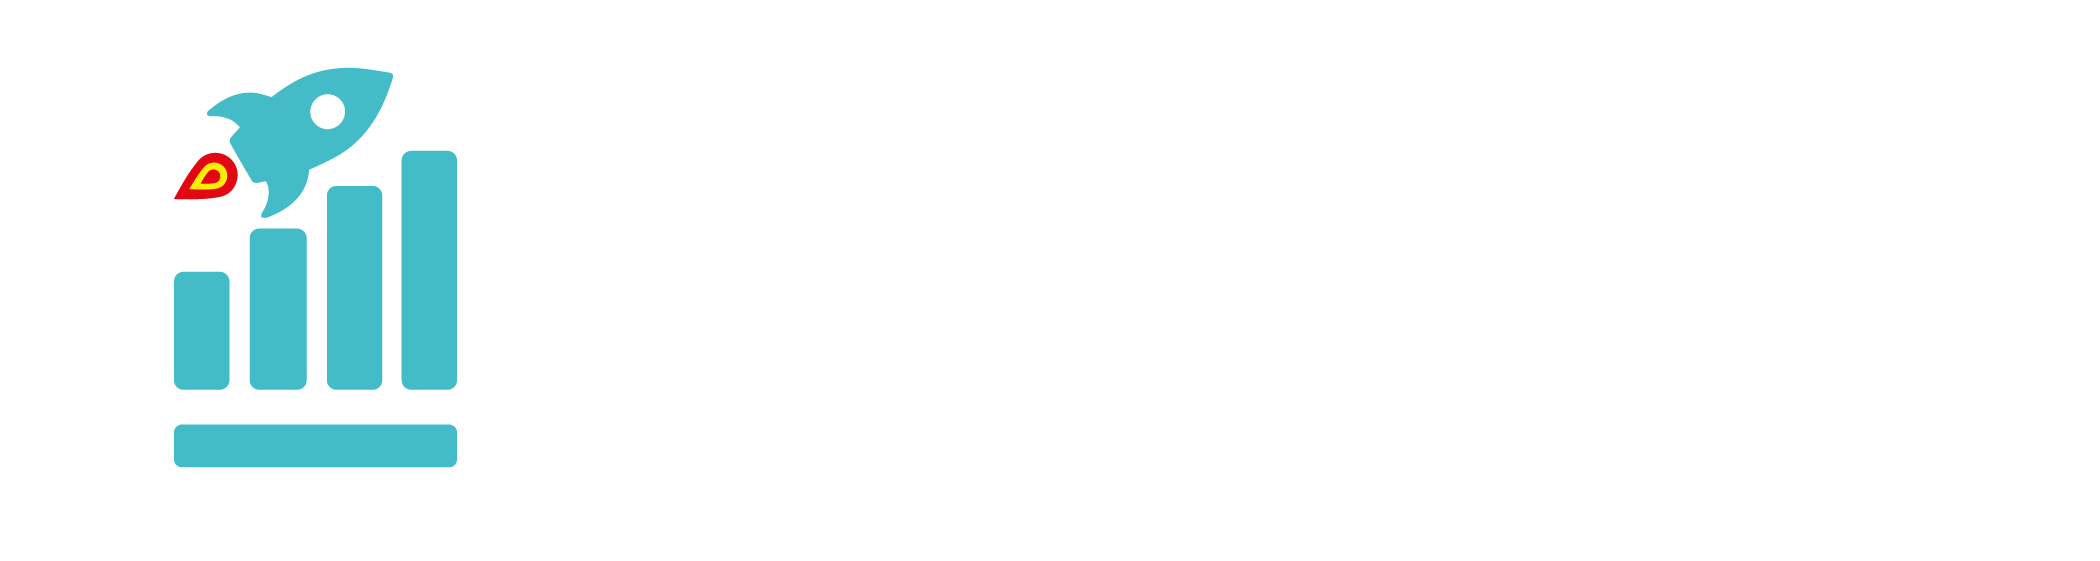 boosters - La community di marketing intelligence